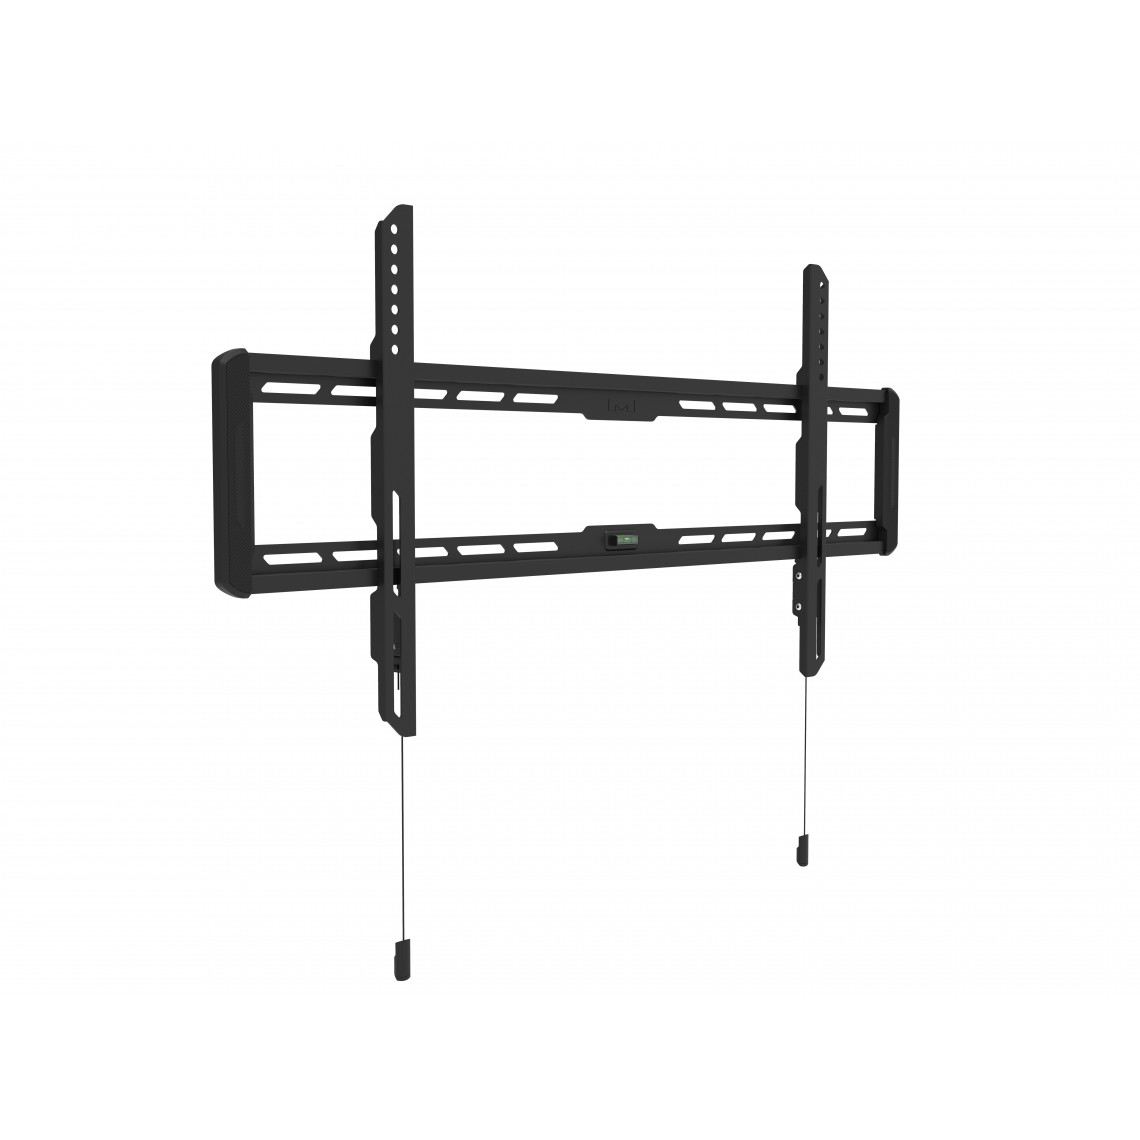 M Universal Wallmount Fixed Large Black